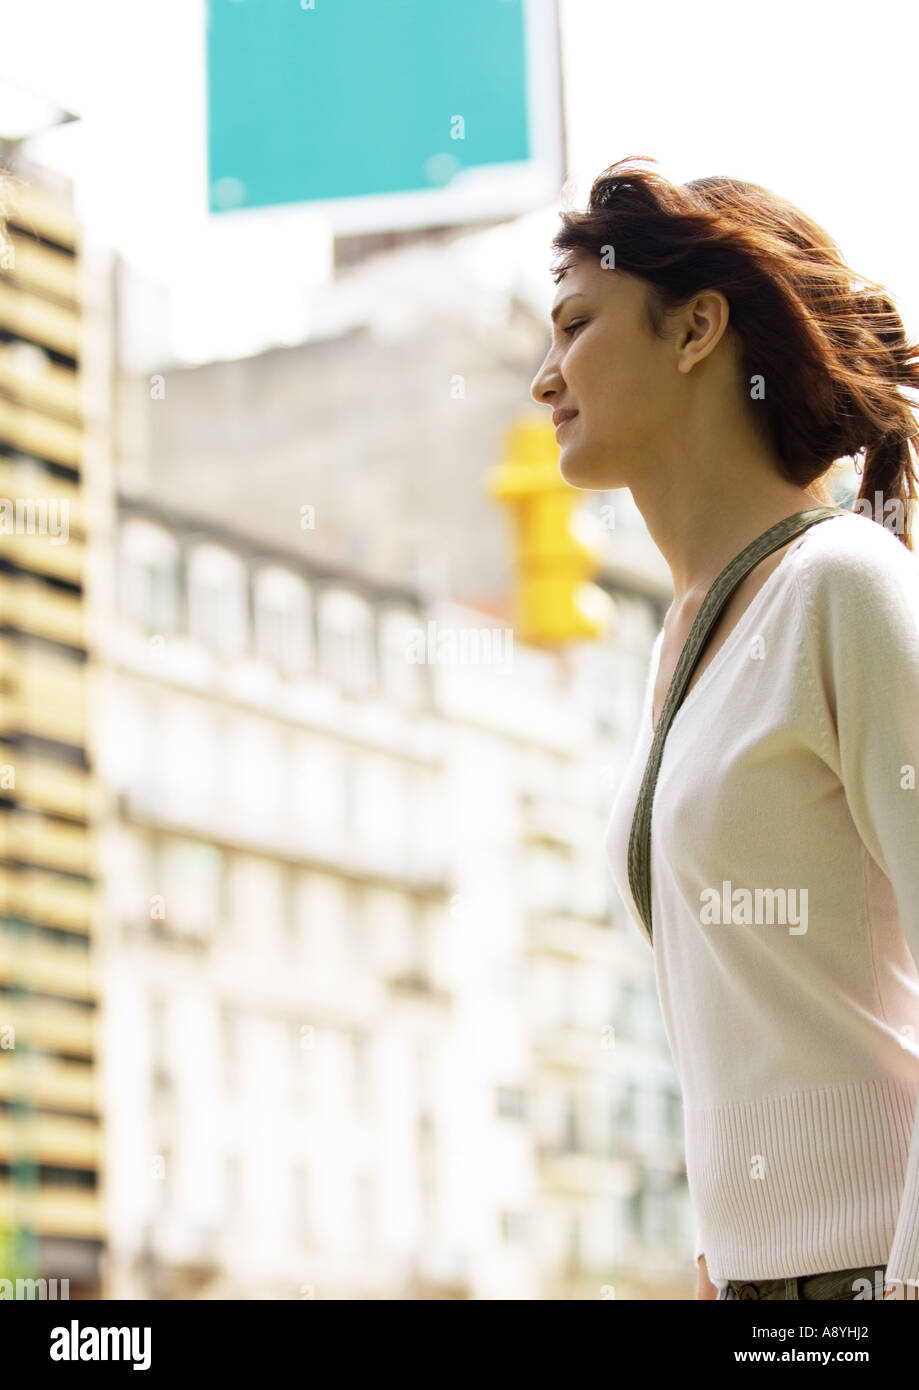 Young woman in urban setting - Stock Image